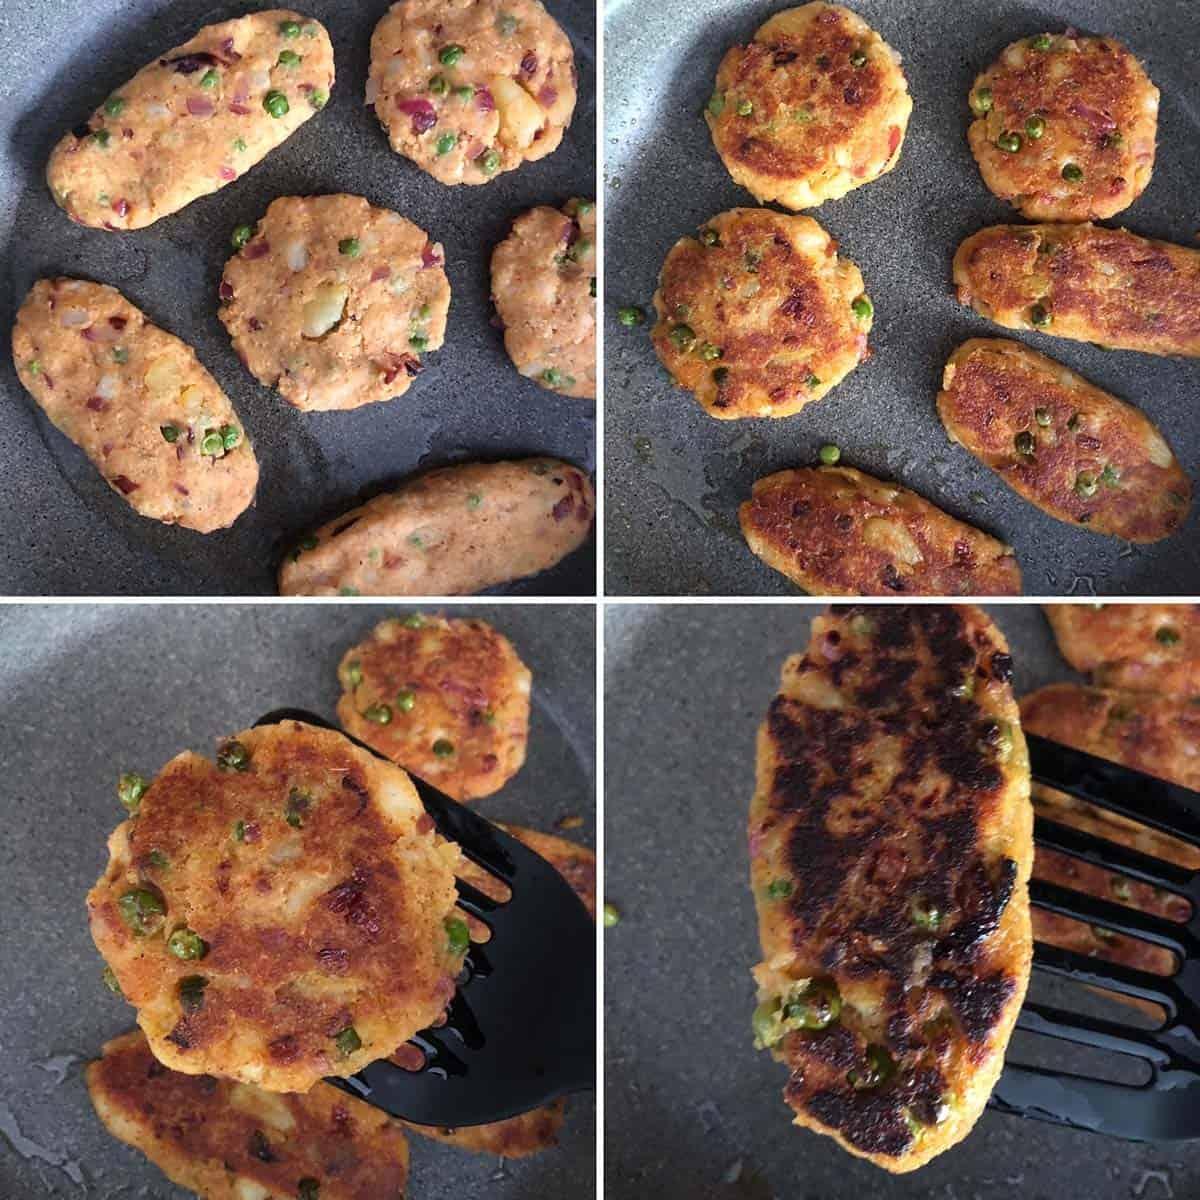 Pan frying potato patties until golden and crispy